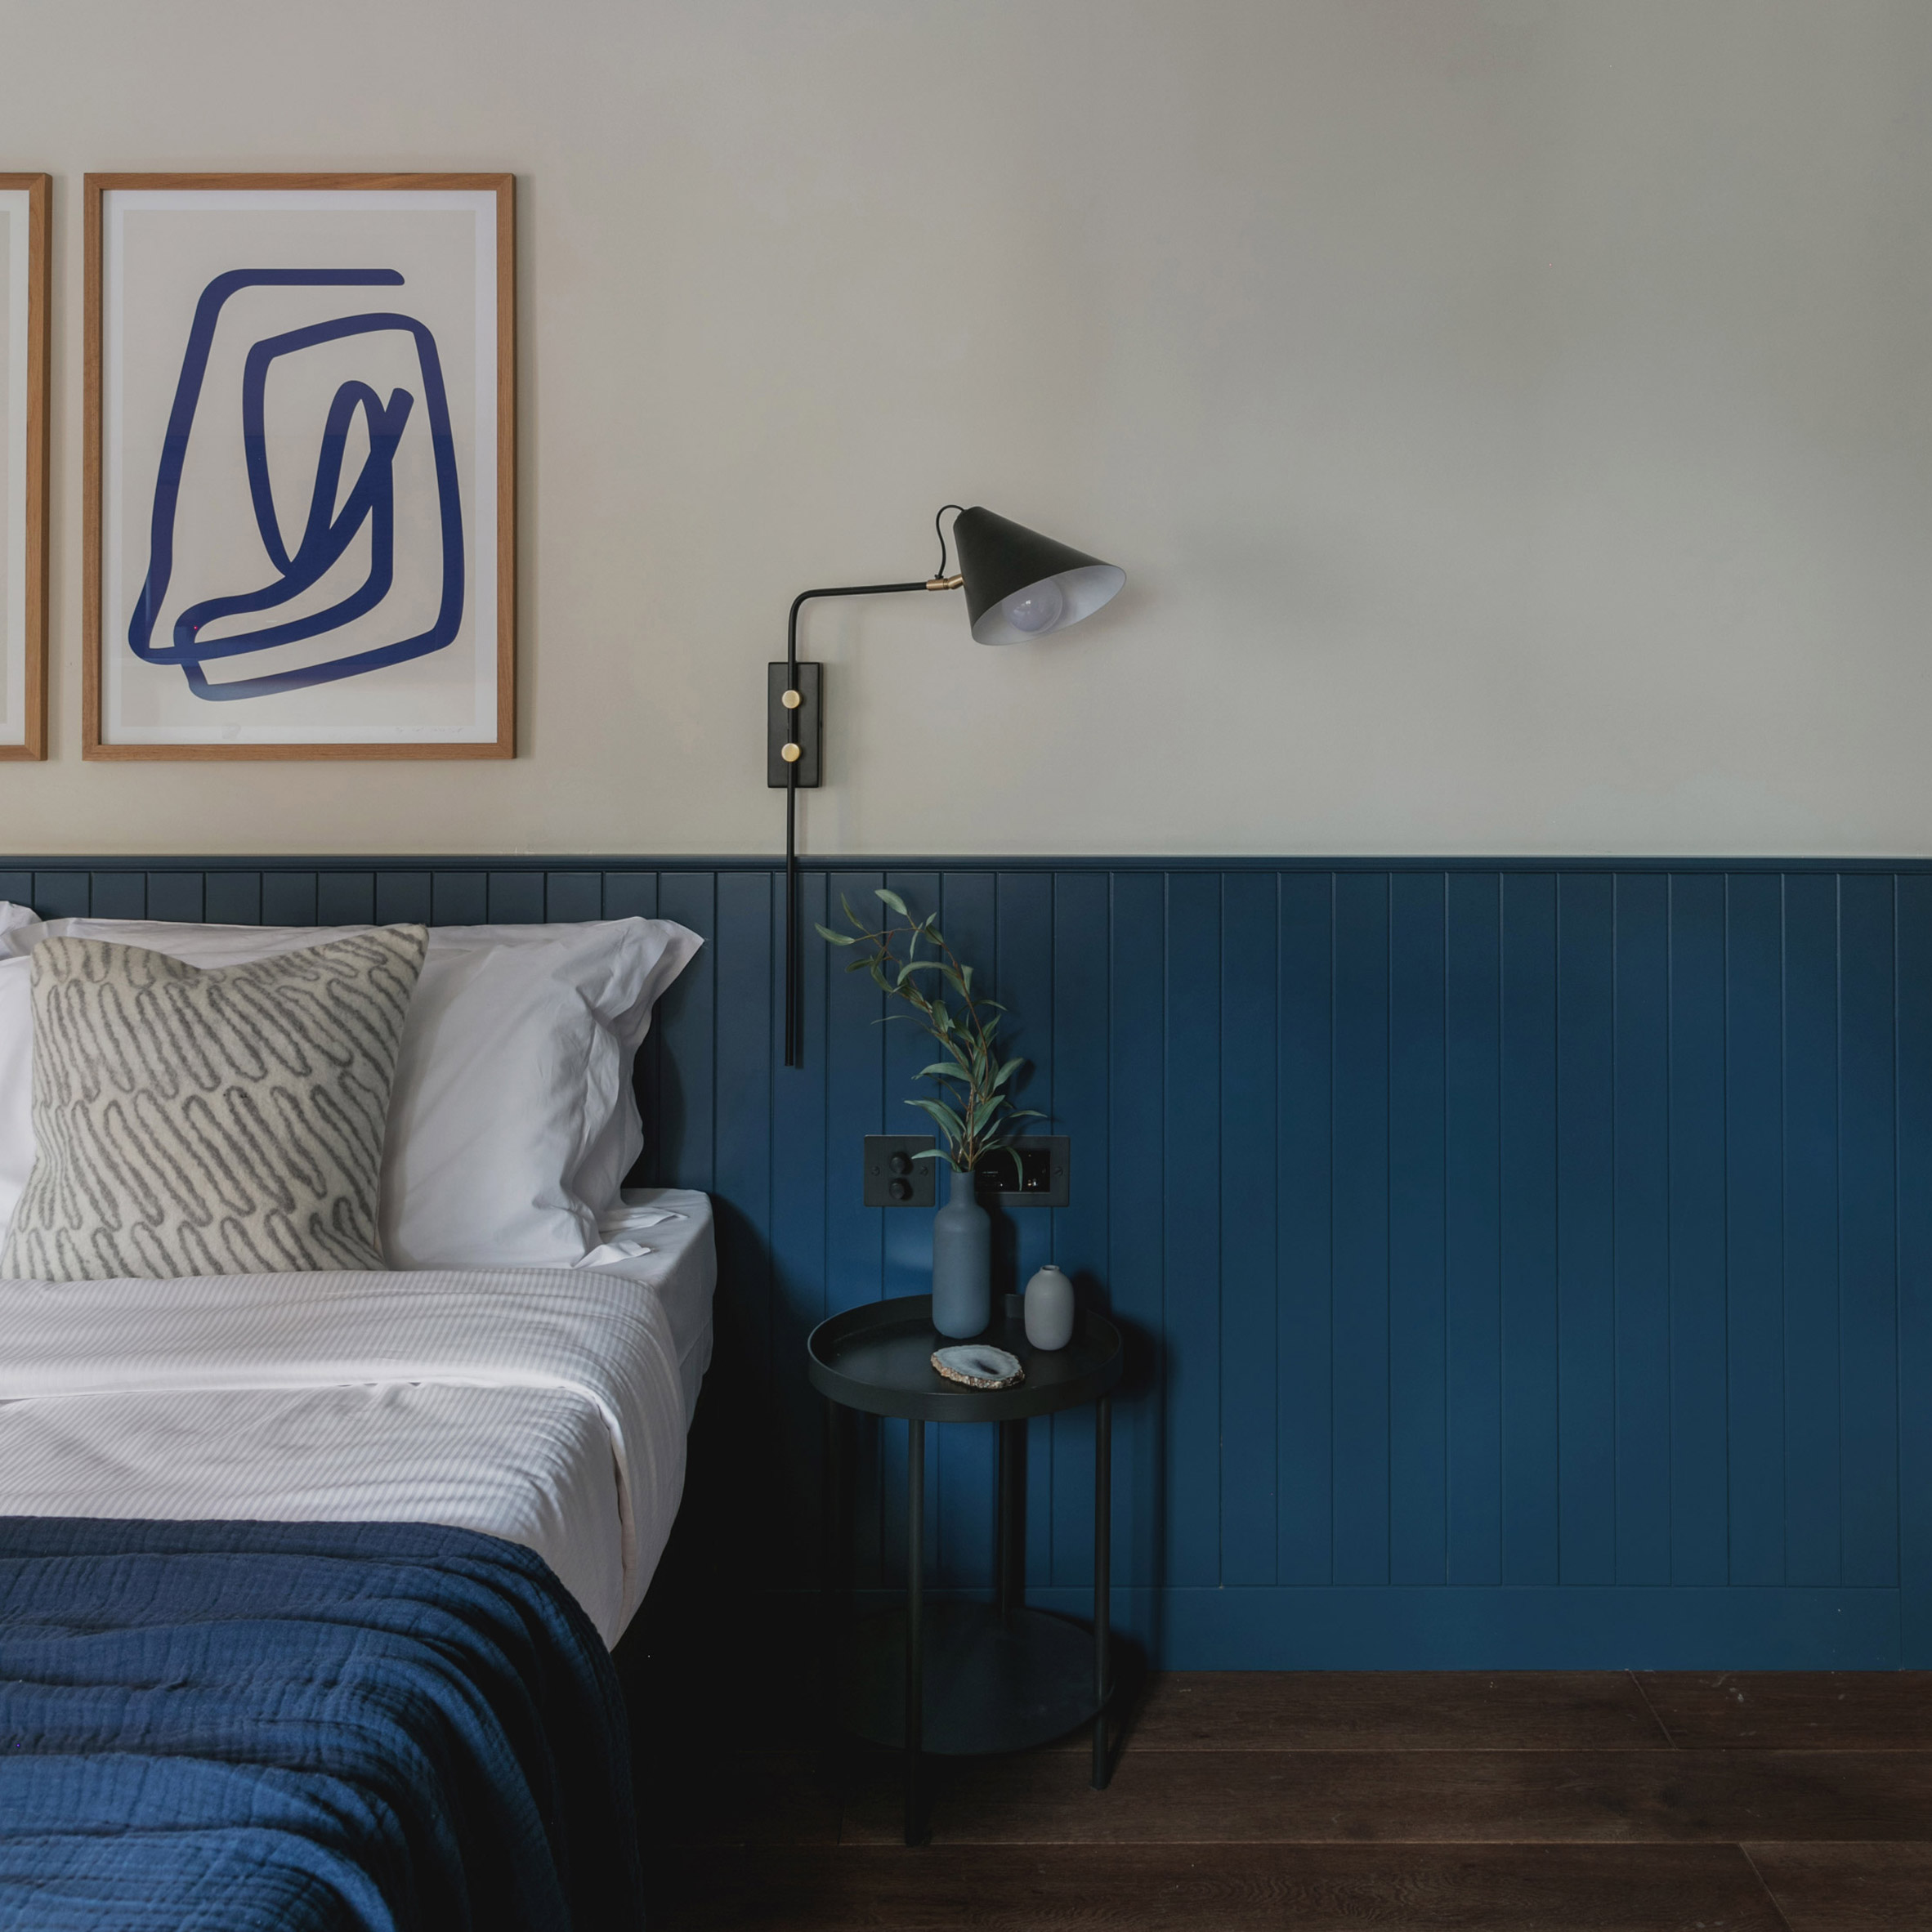 Hotels in Italy: Interiors of Albergo Miramonti hotel, designed by Boxx Creative